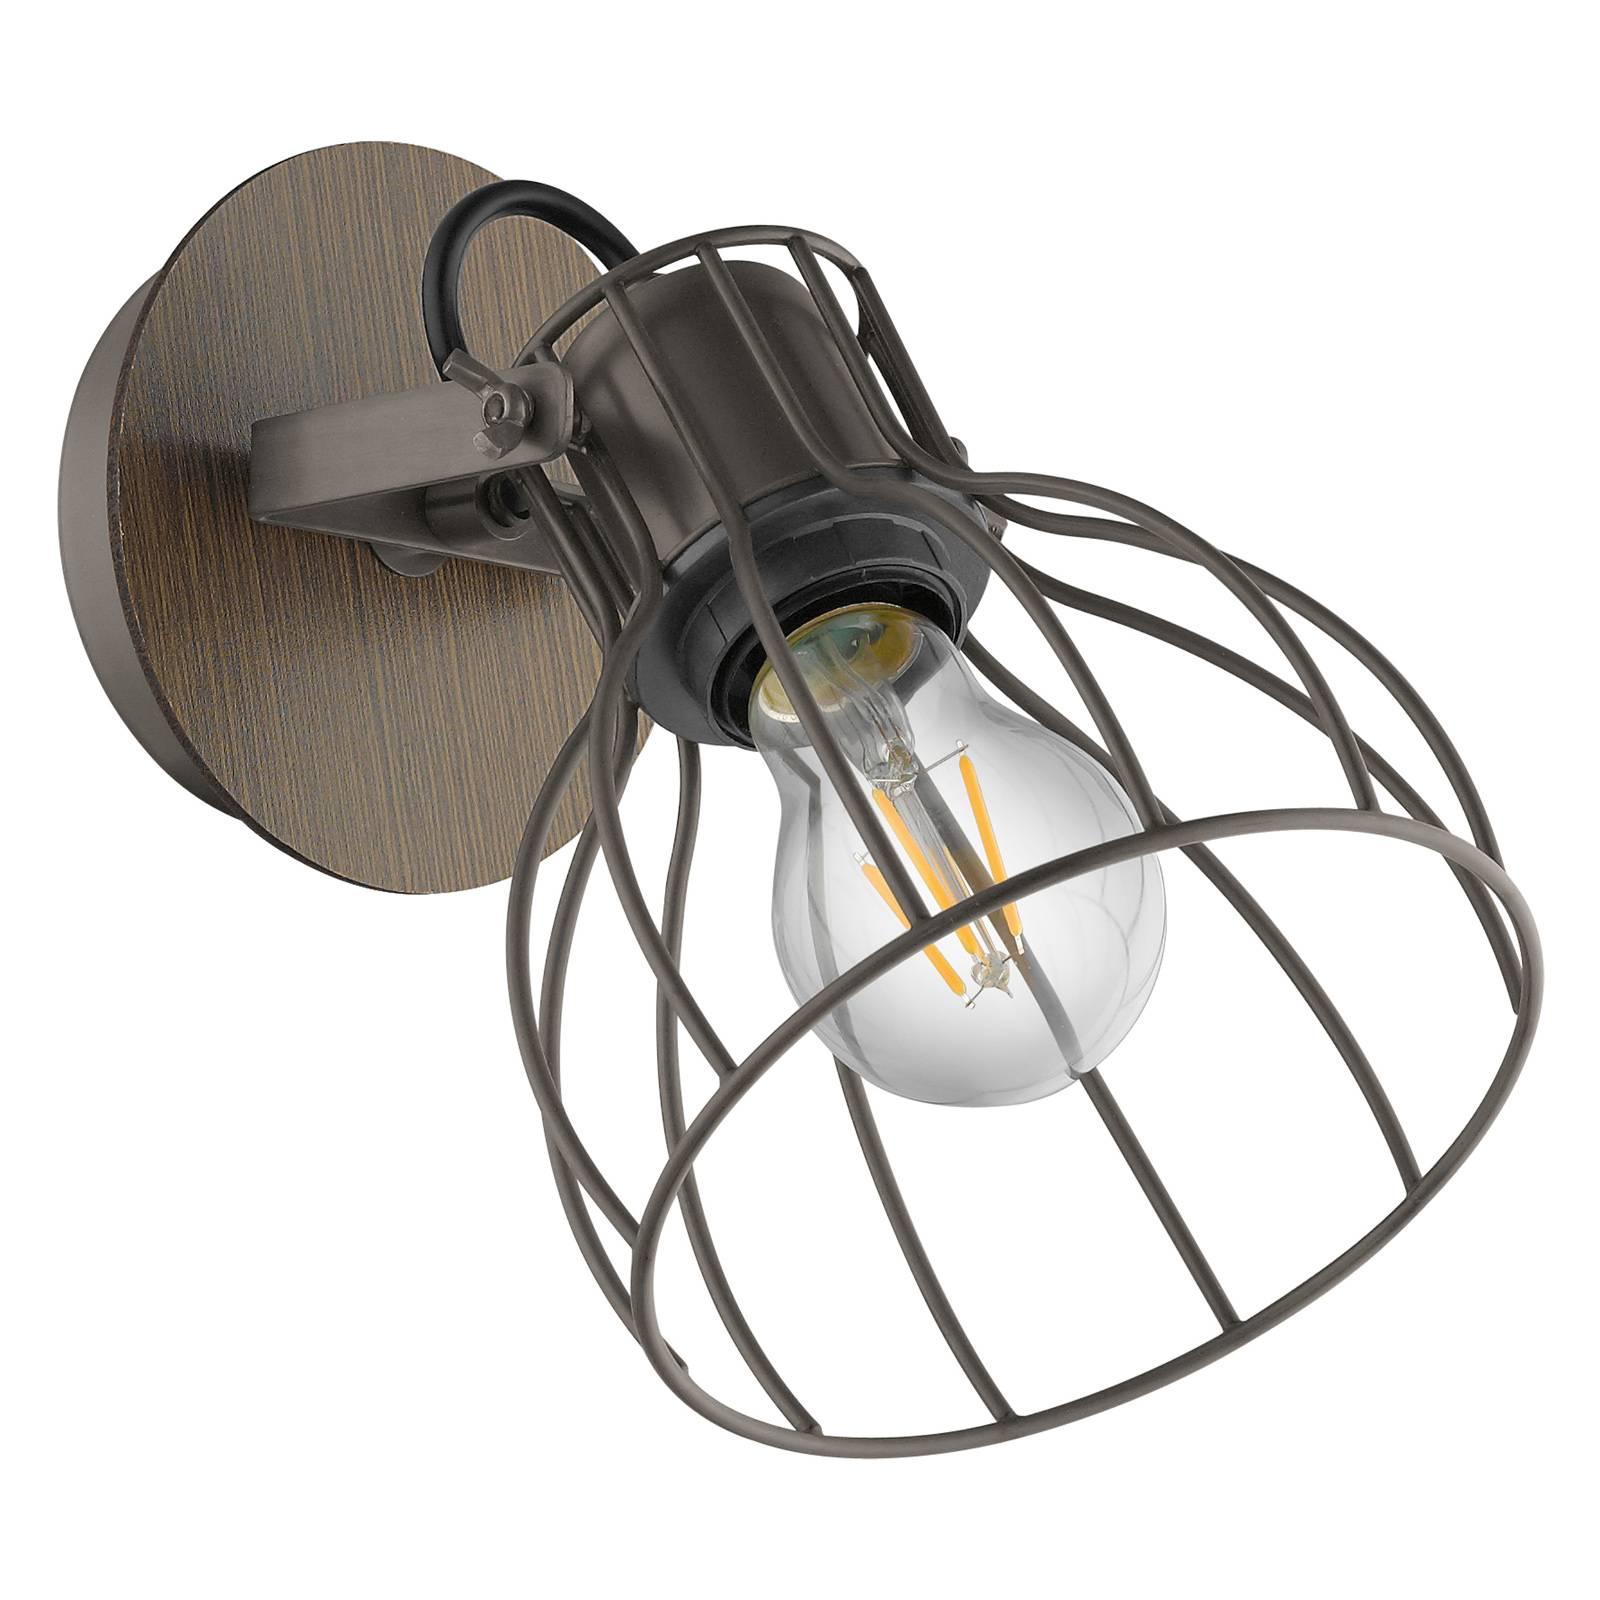 Wandlamp Sambatello met kooikap, 1-lamp